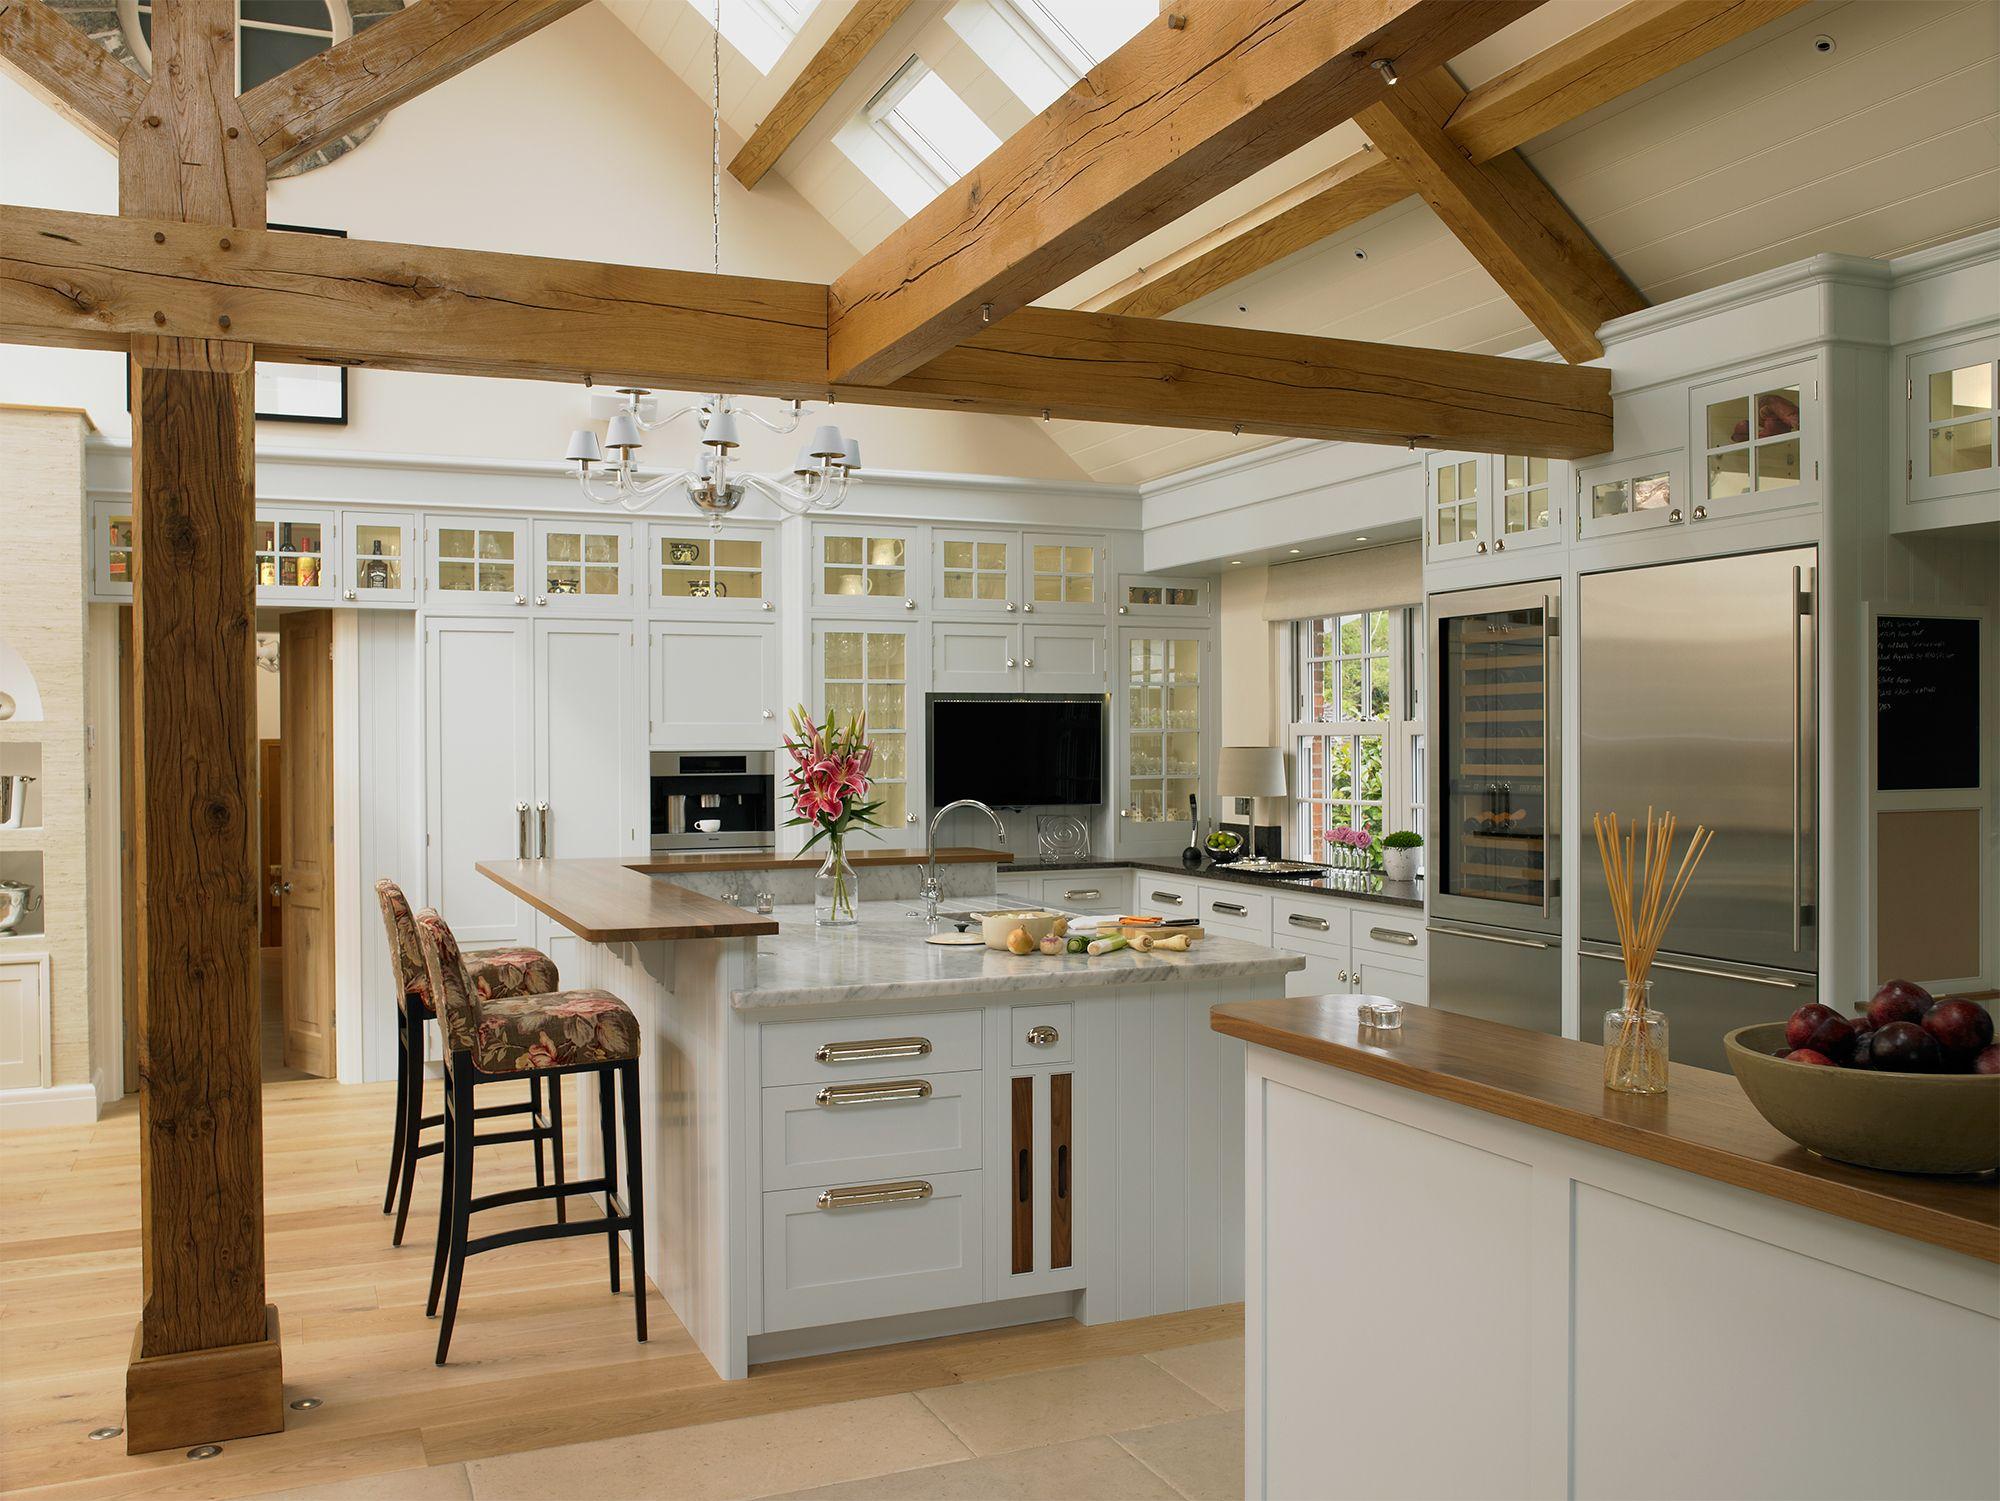 Luxury Bespoke Kitchens New England Collection Mark